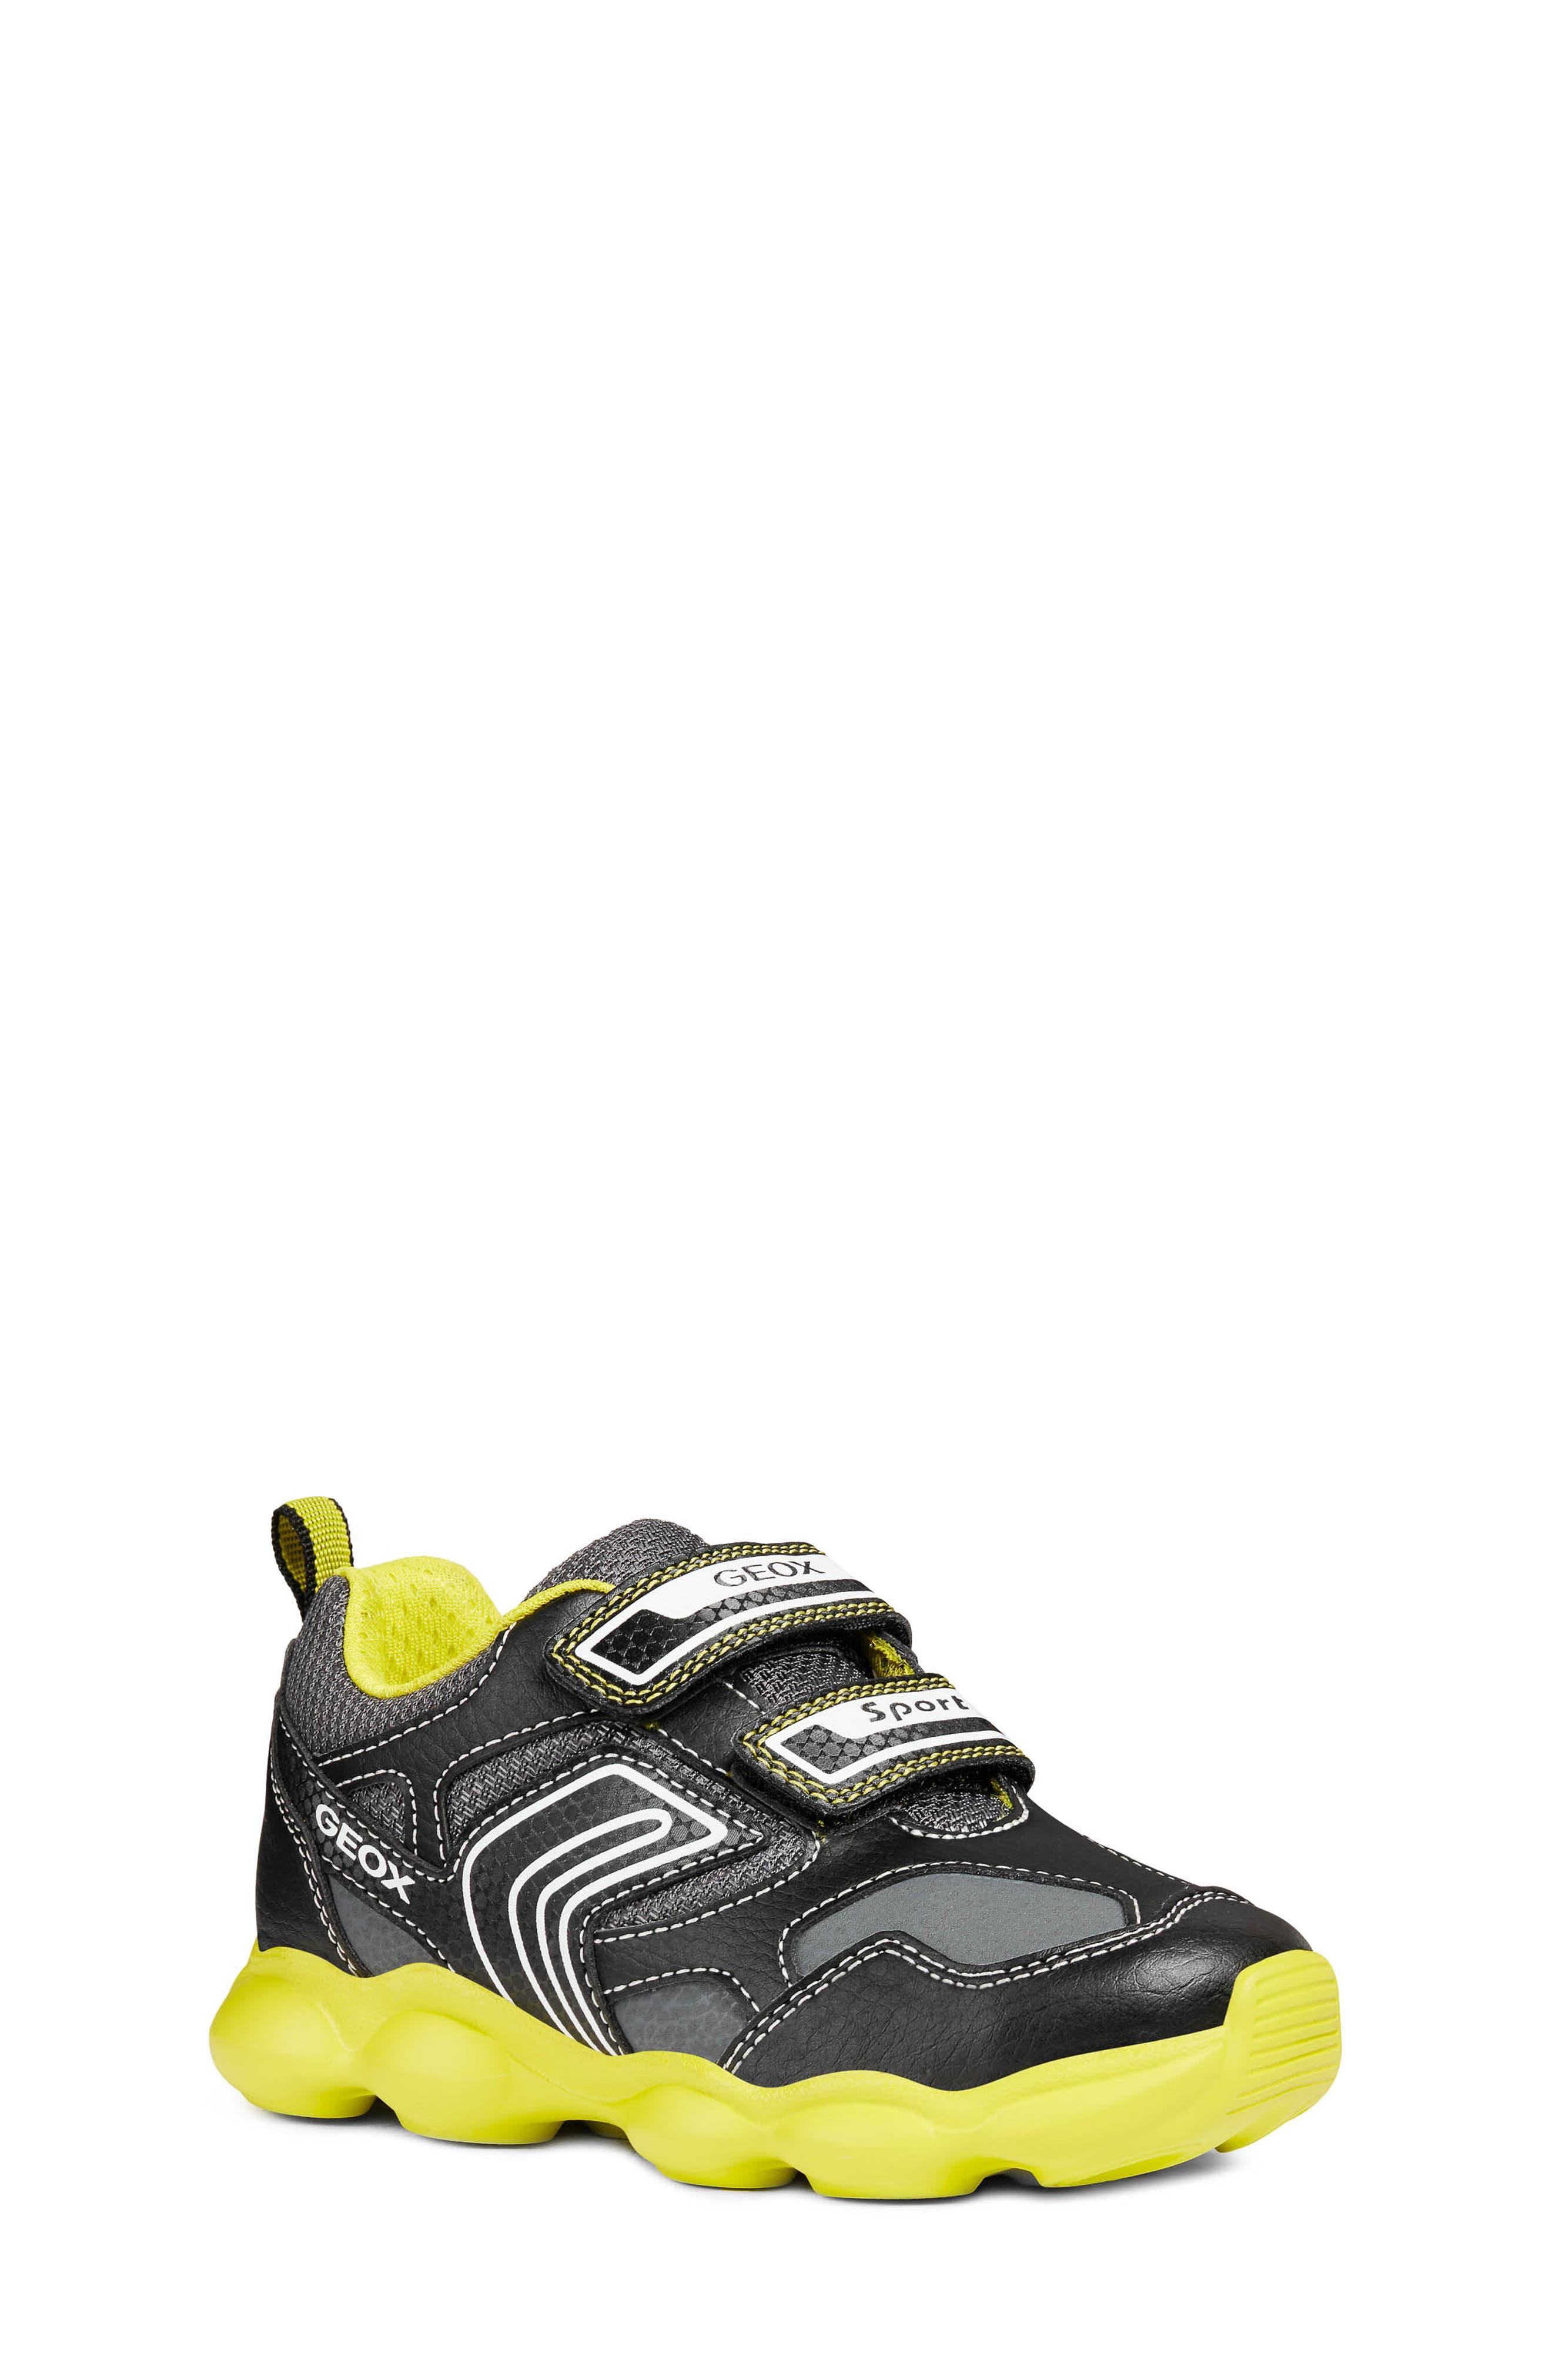 Munfrey Sneaker,                             Main thumbnail 1, color,                             001